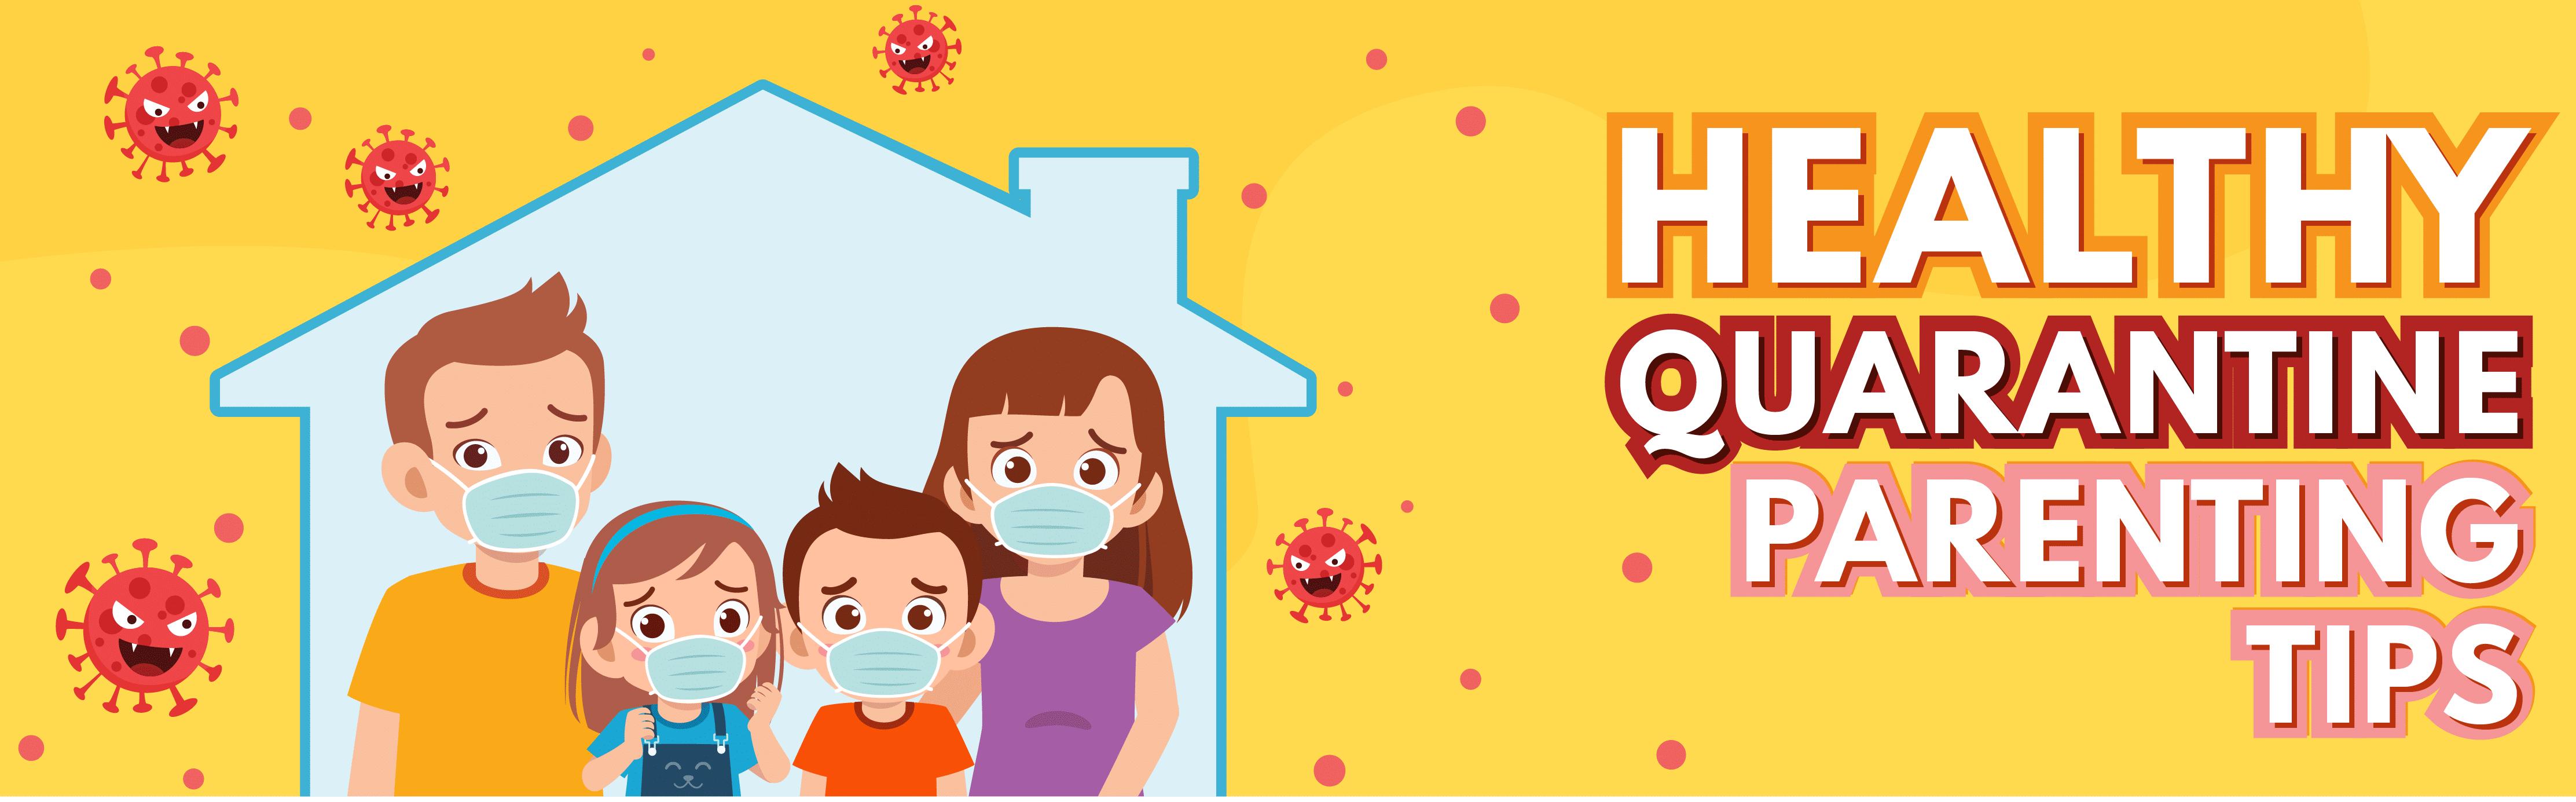 Healthy Quarantine Parenting Tips